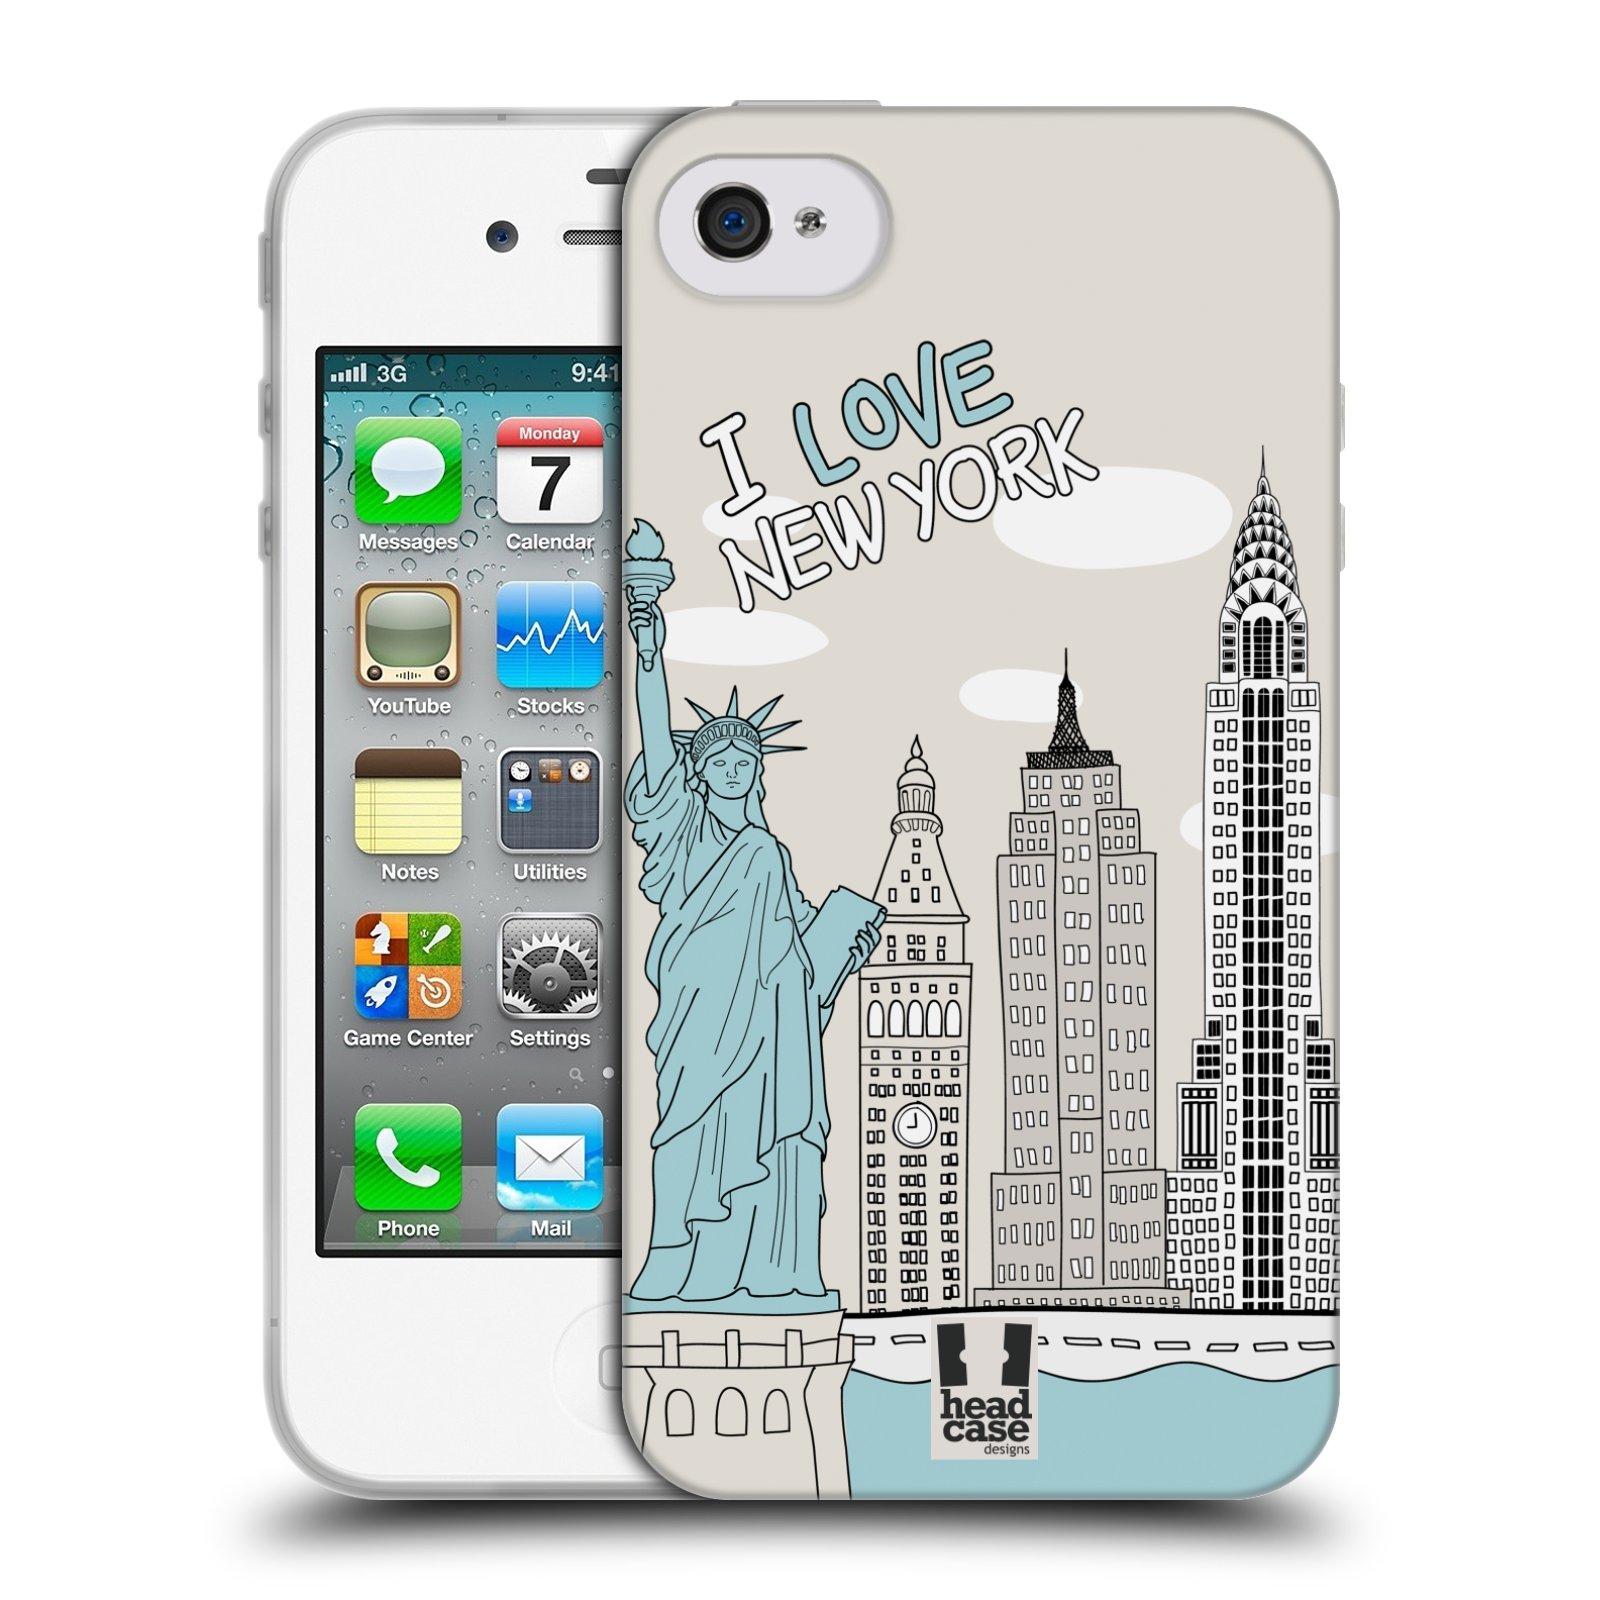 HEAD CASE silikonový obal na mobil Apple Iphone 4/4S vzor Kreslená městečka MODRÁ, USA, New York, I LOVE NEW YORK